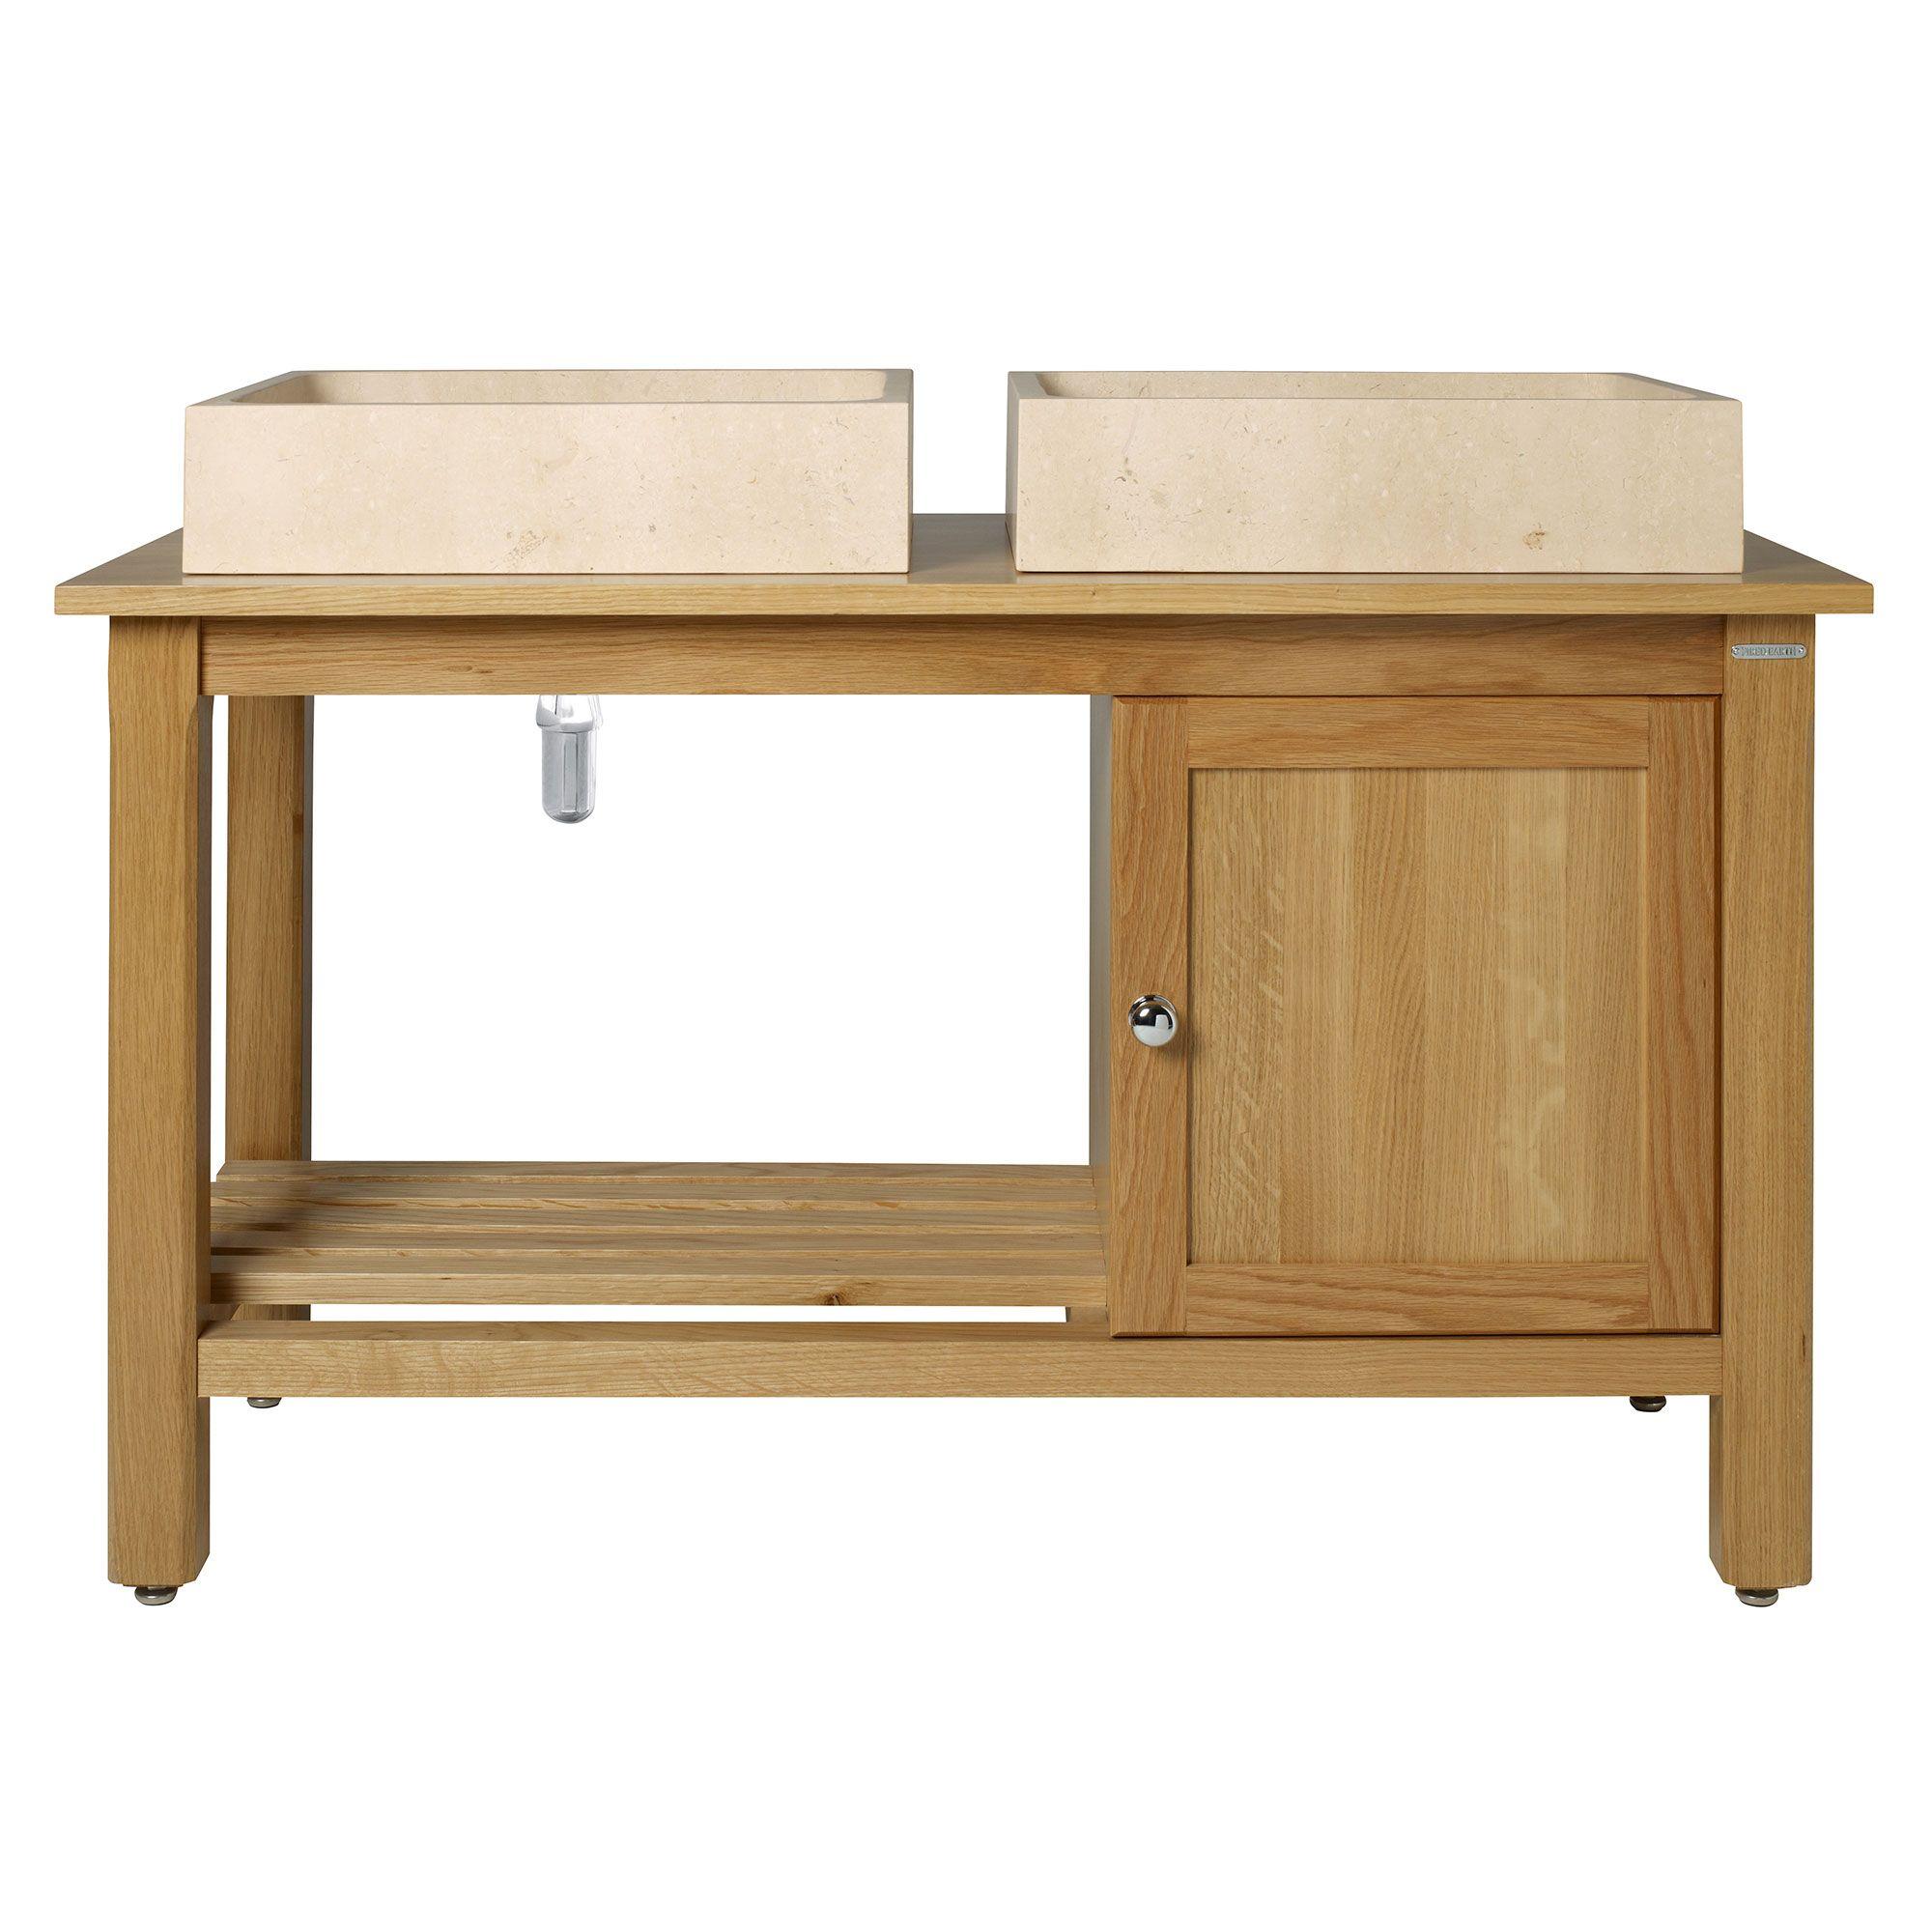 Logic Washstand 1200 With Cupboard